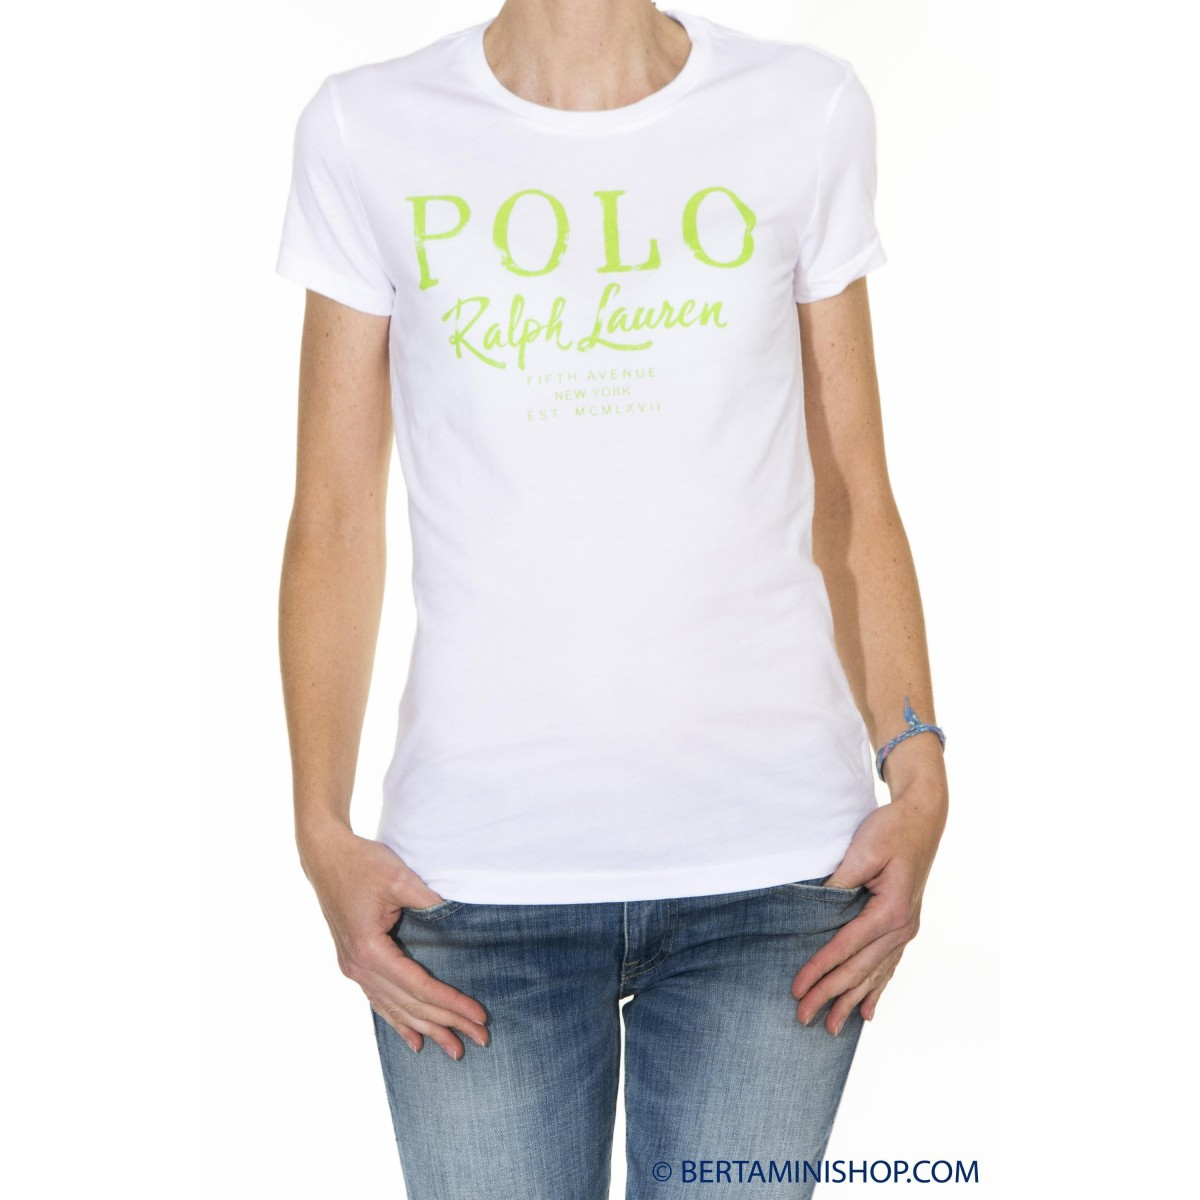 T-Shirt Ralph Lauren Woman - V38Ih624Bh624 Tshirt Logo B1H07